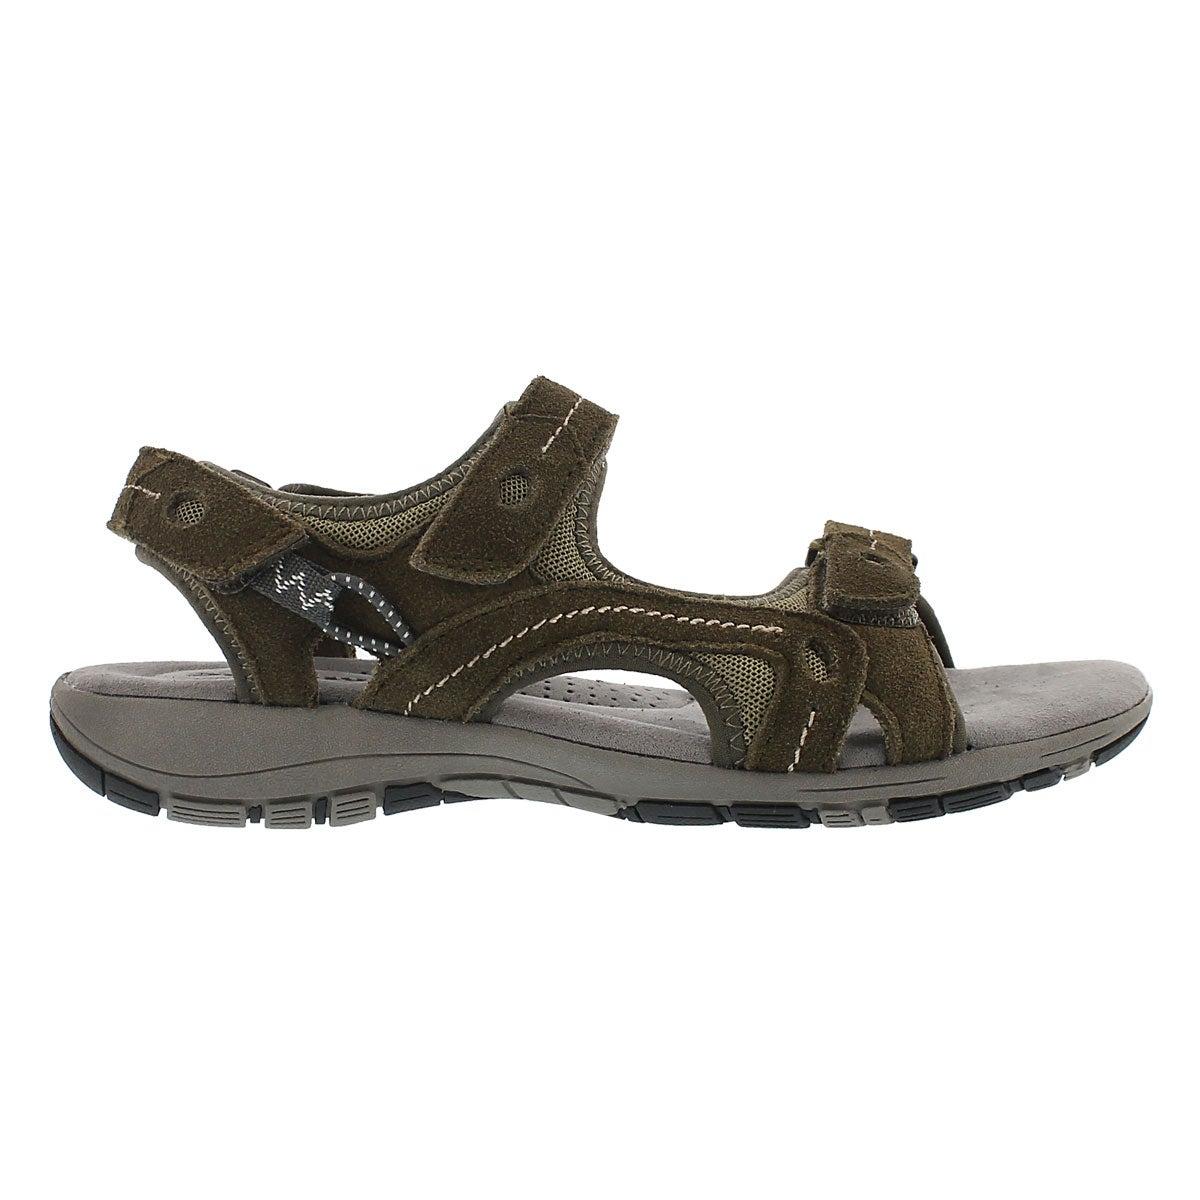 Lds Gladys kki 3-strap mem. foam sandal